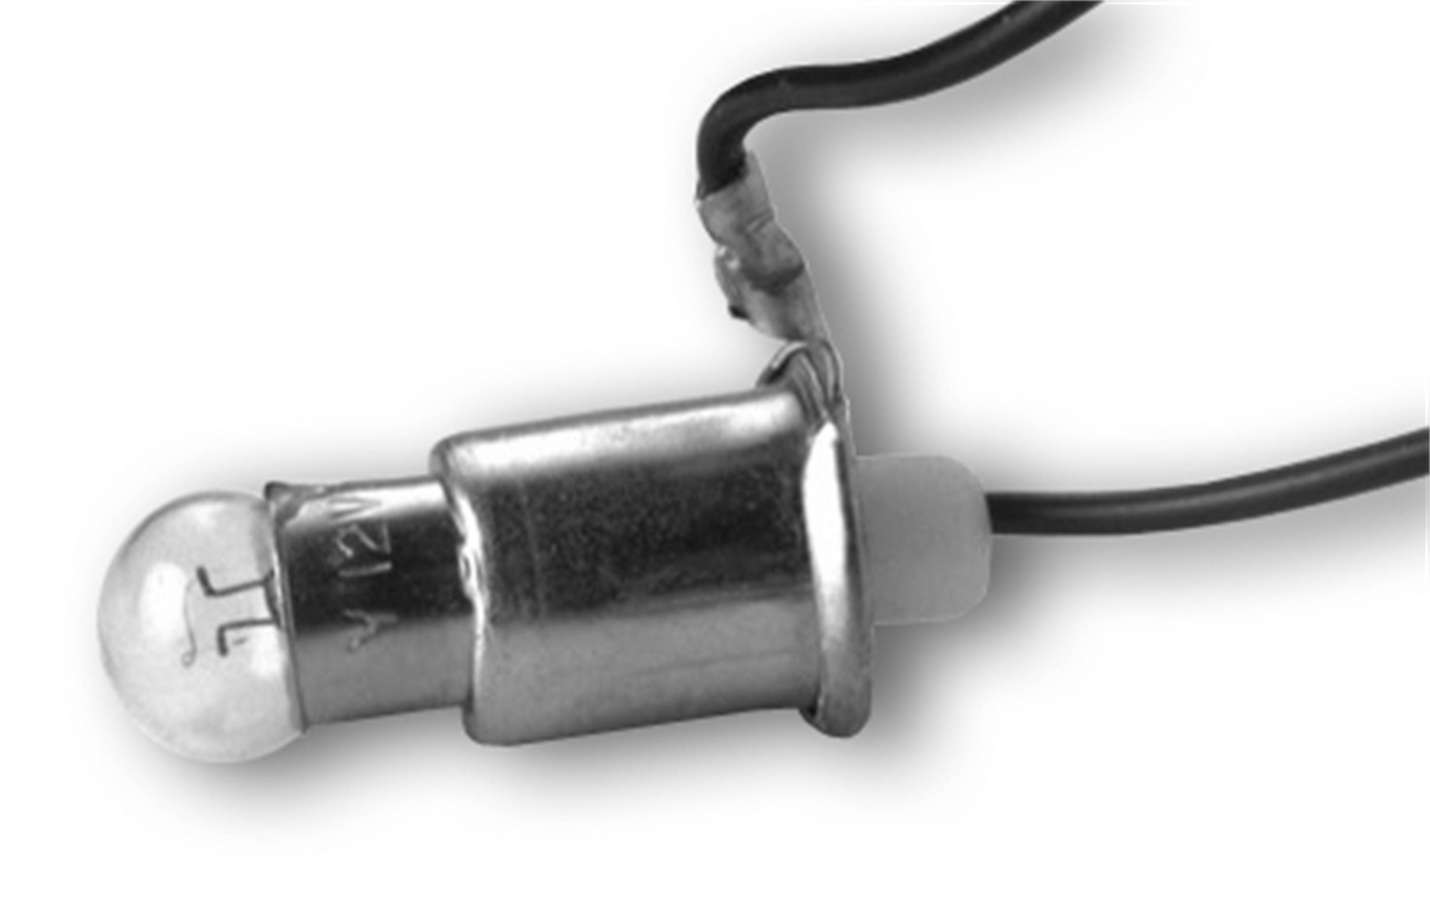 Auto Meter 2357 Bulb and Socket, 2 watt, Auto Gage 2-1/16 in Gauges, Each